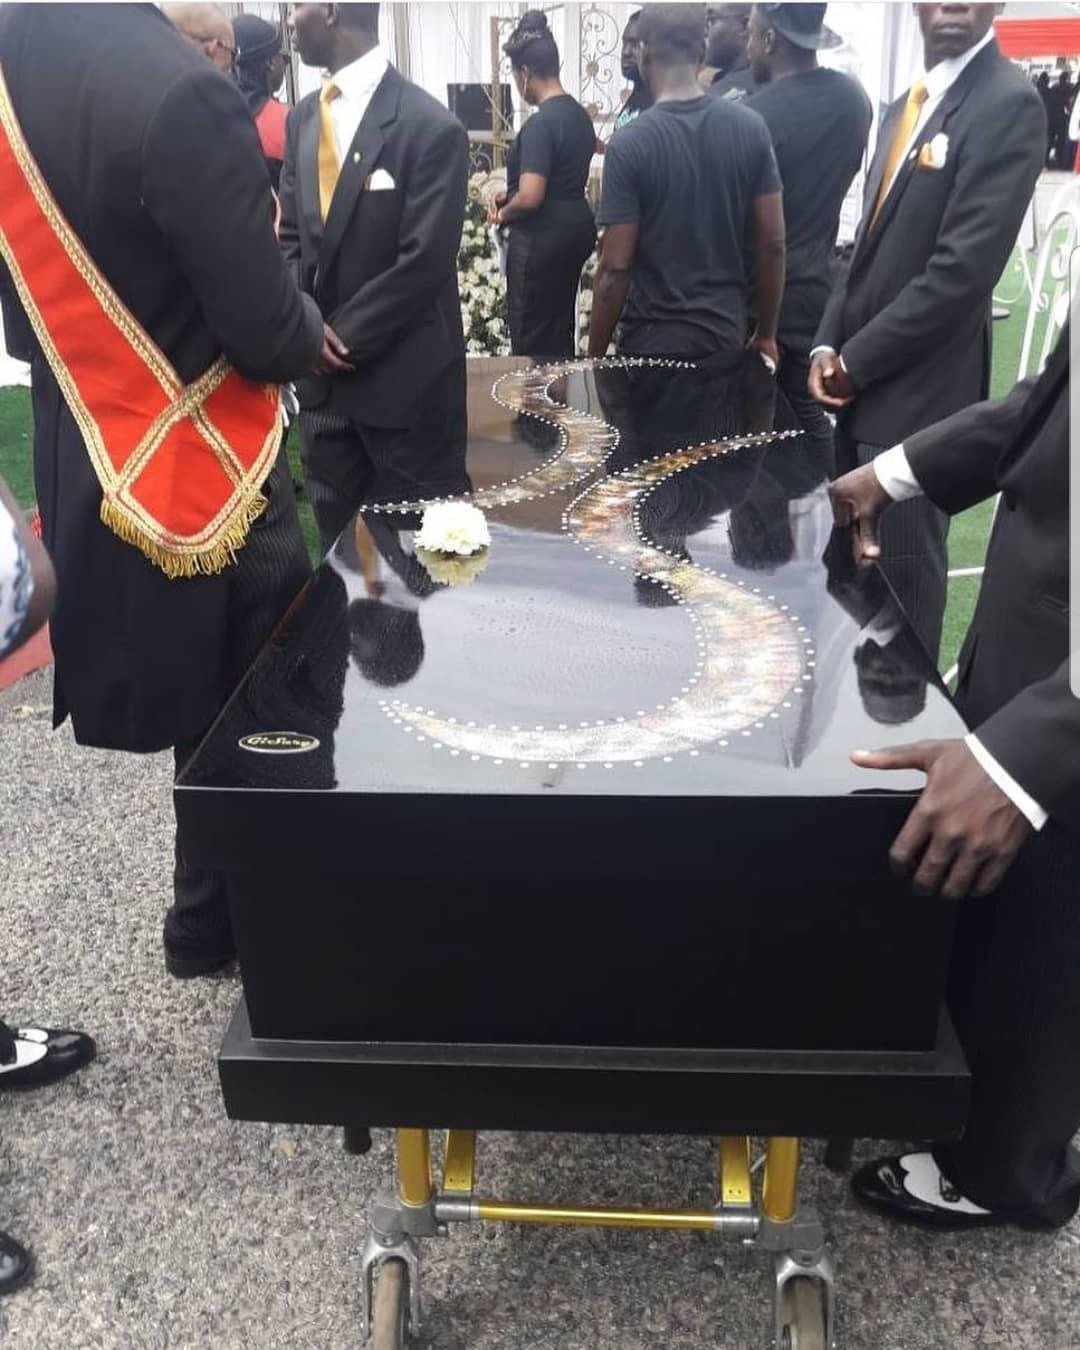 Ebony Reigns Funeral